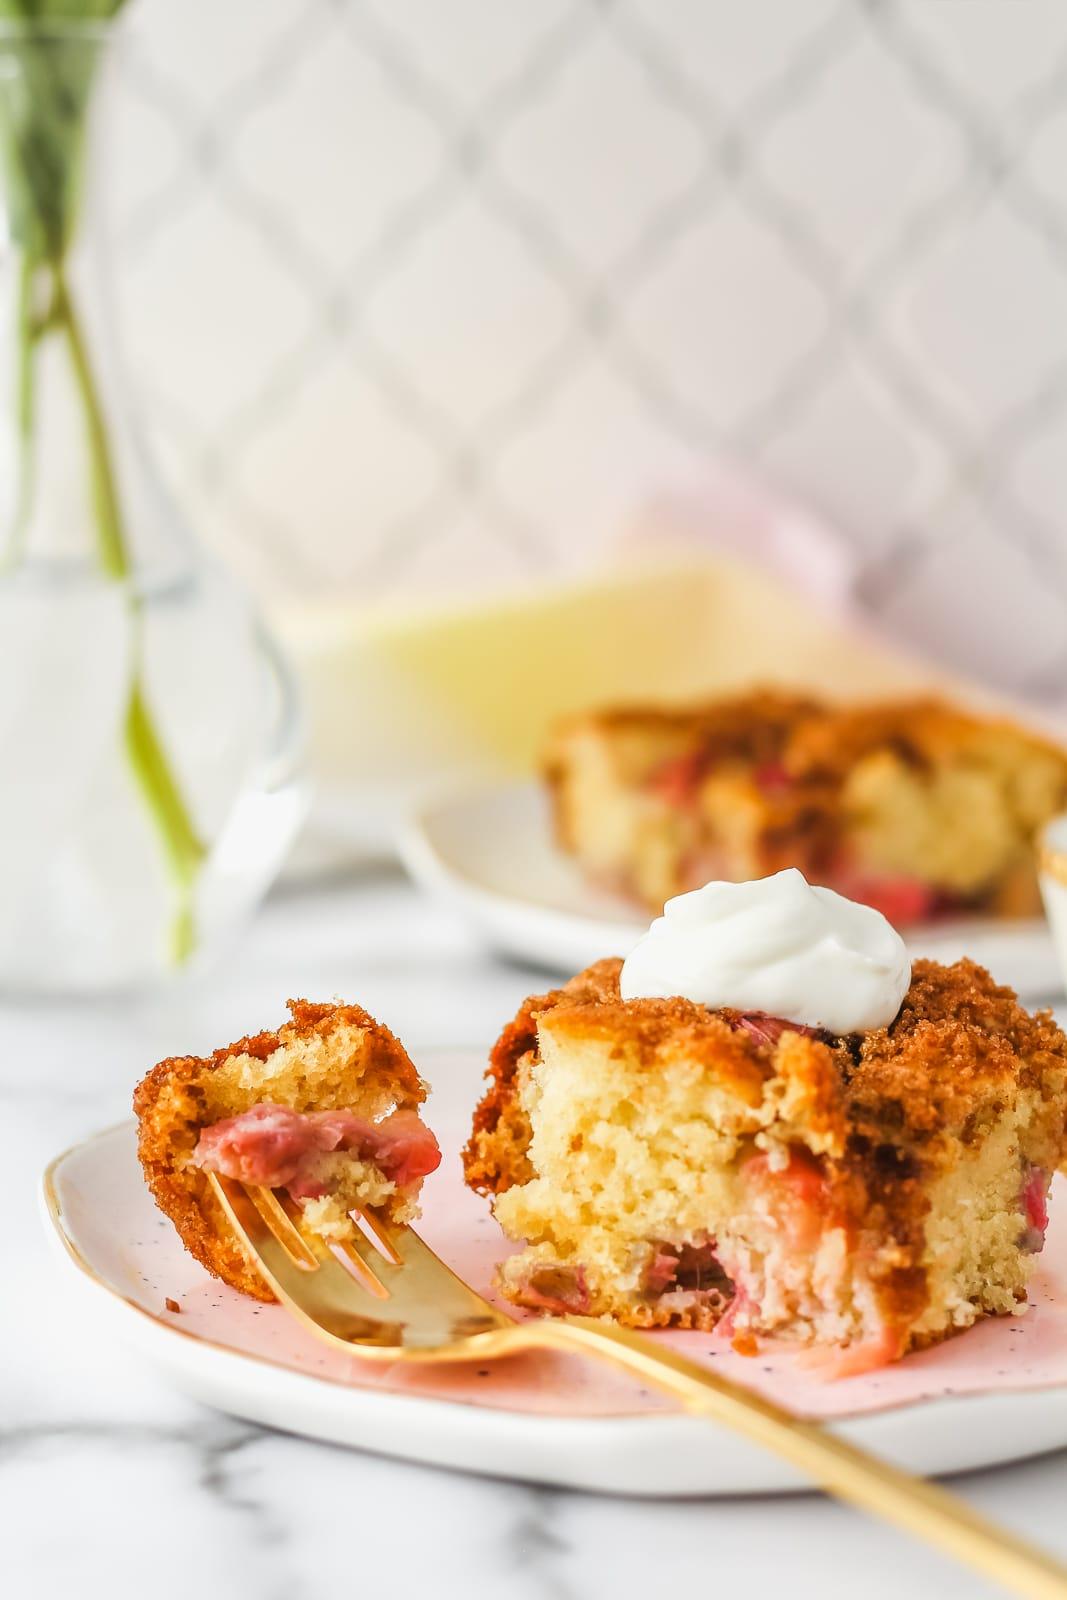 Strawberry and Rhubarb Recipes